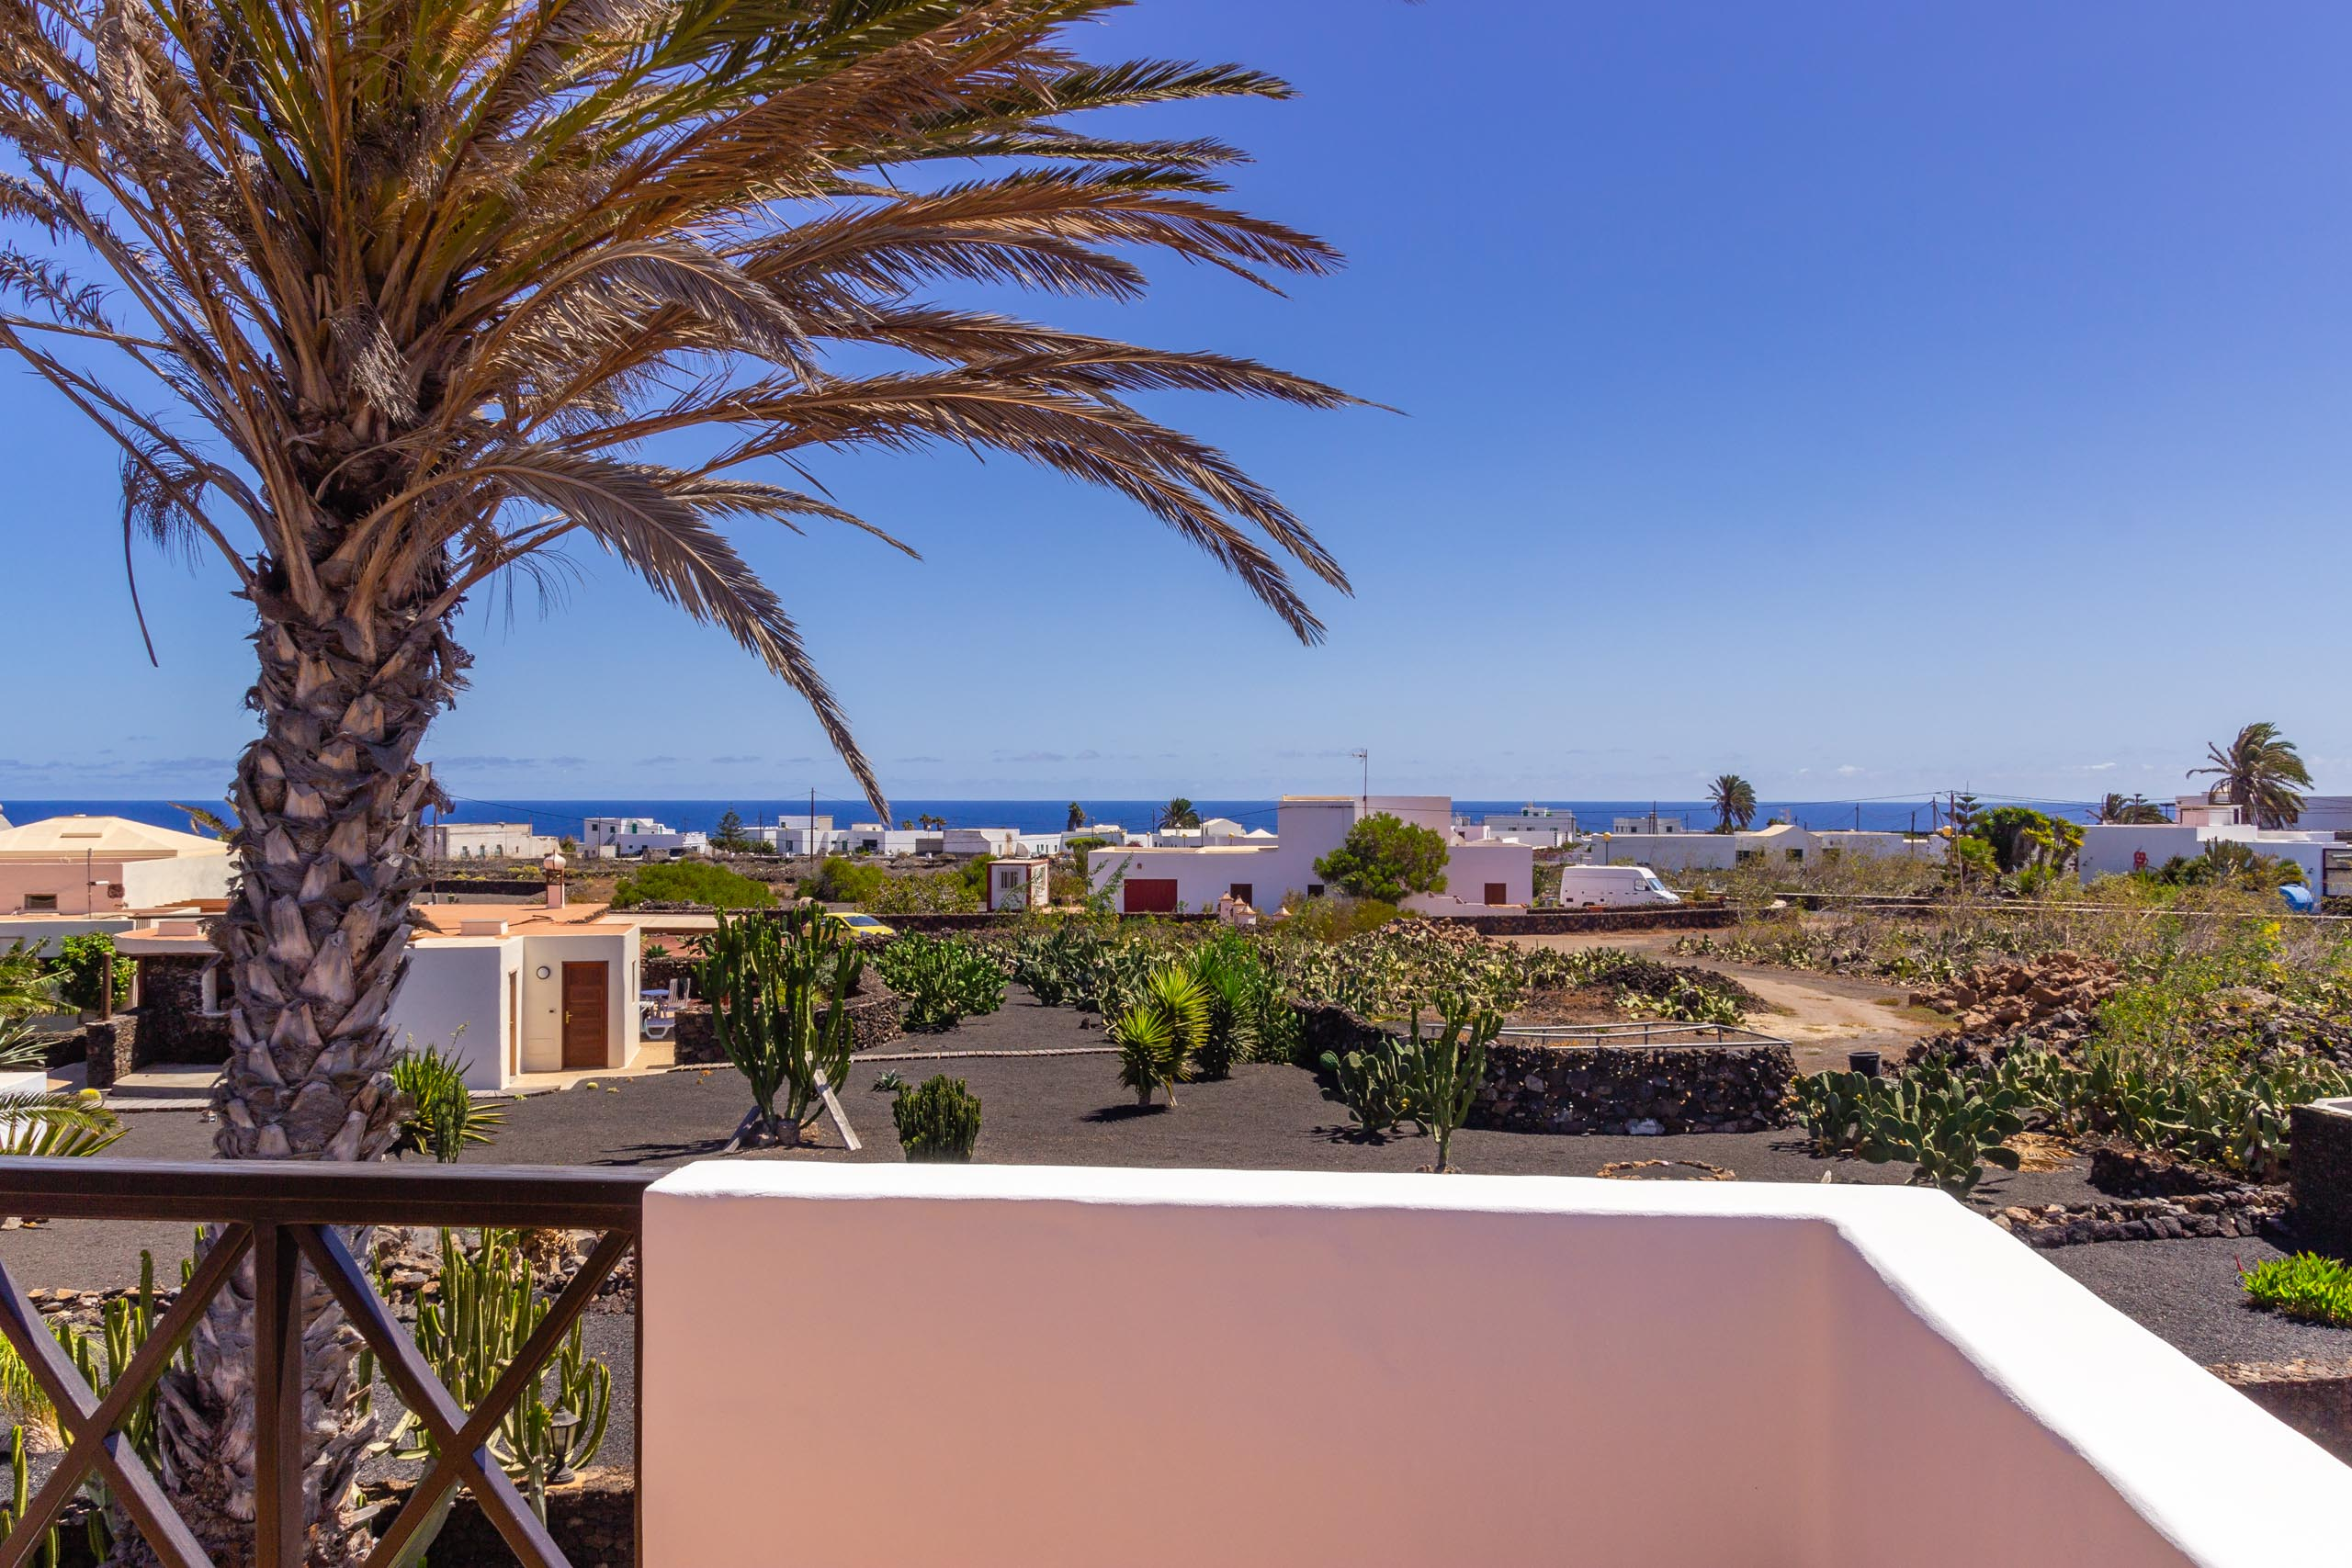 2016 09 Lanzarote GardenNeighbourhood 2 003